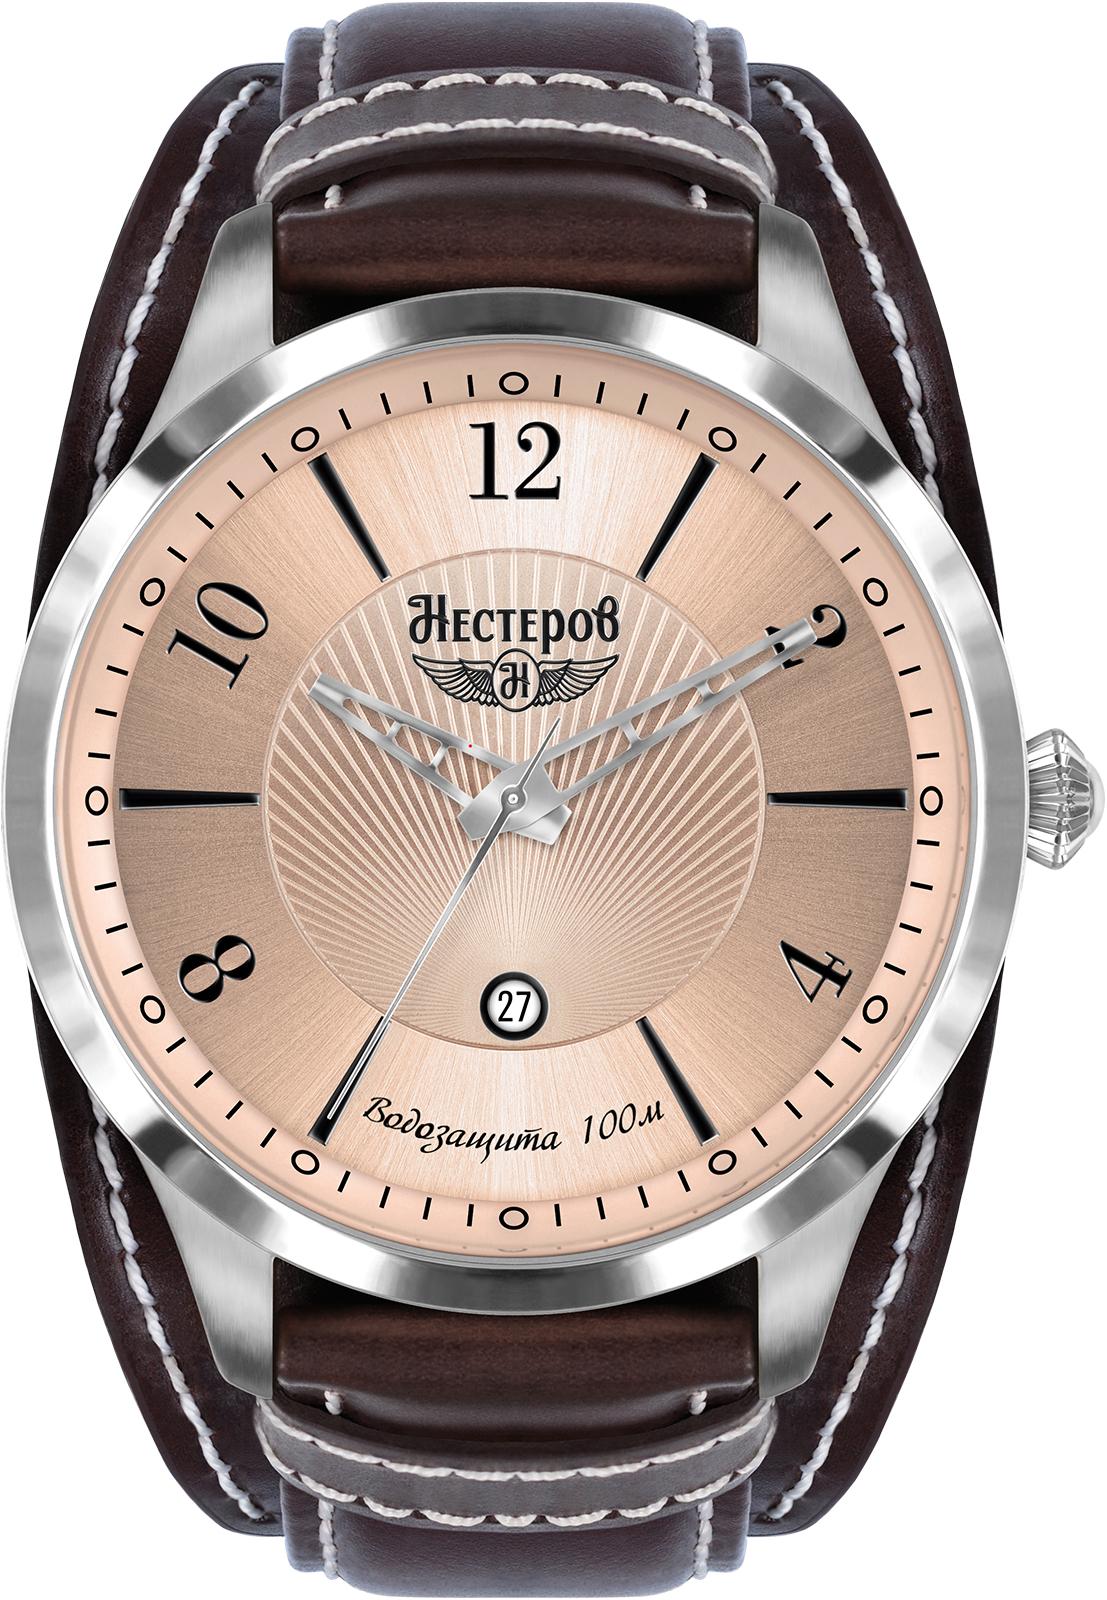 Часы Нестеров H0983B02-14D цена